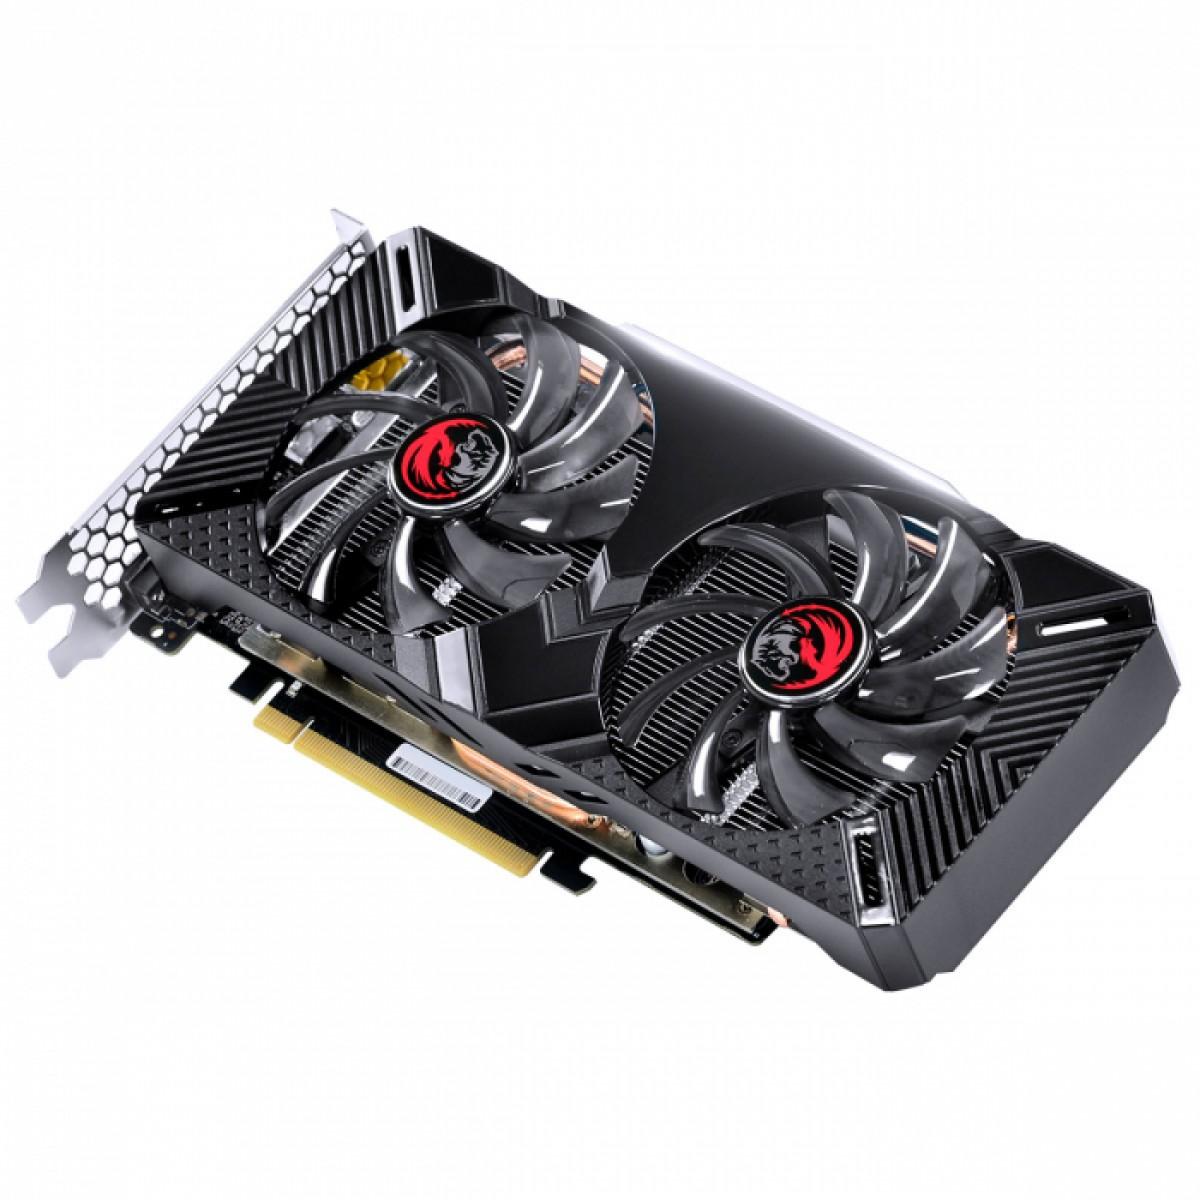 Placa de Vídeo PCyes GeForce GTX 1660 Dual, 6GB GDDR5, 192Bit, PPOC166019206G5